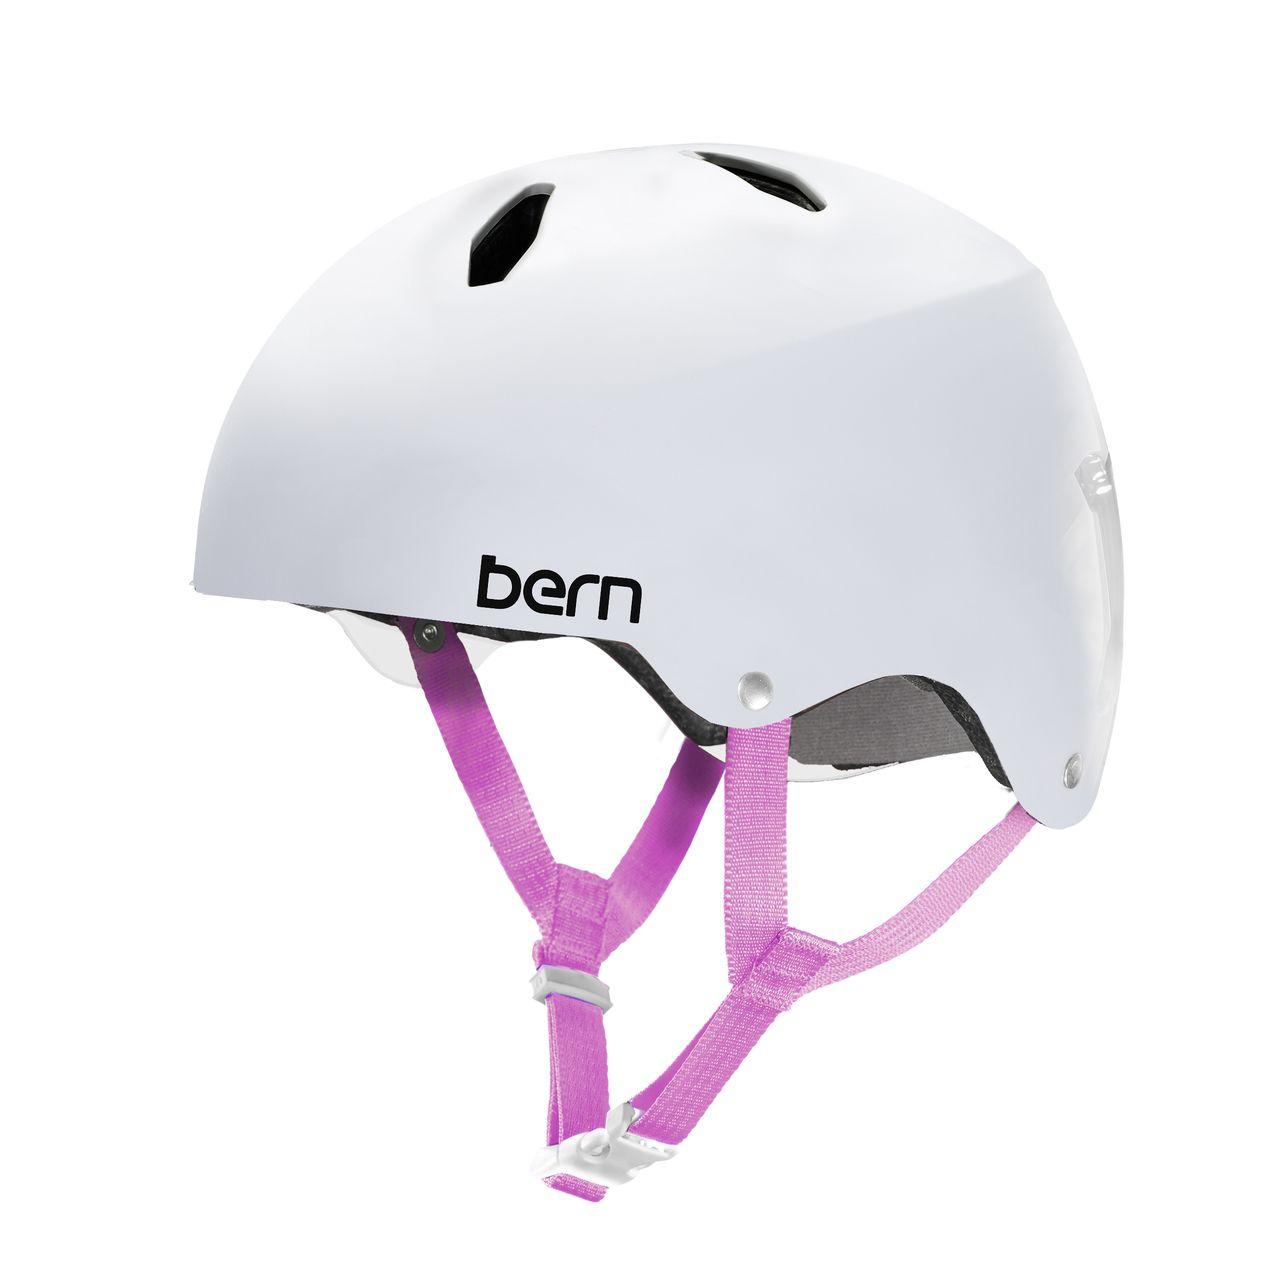 Bern Diabla 2018 Kids Helmets Cool Bicycles Mountain Bike